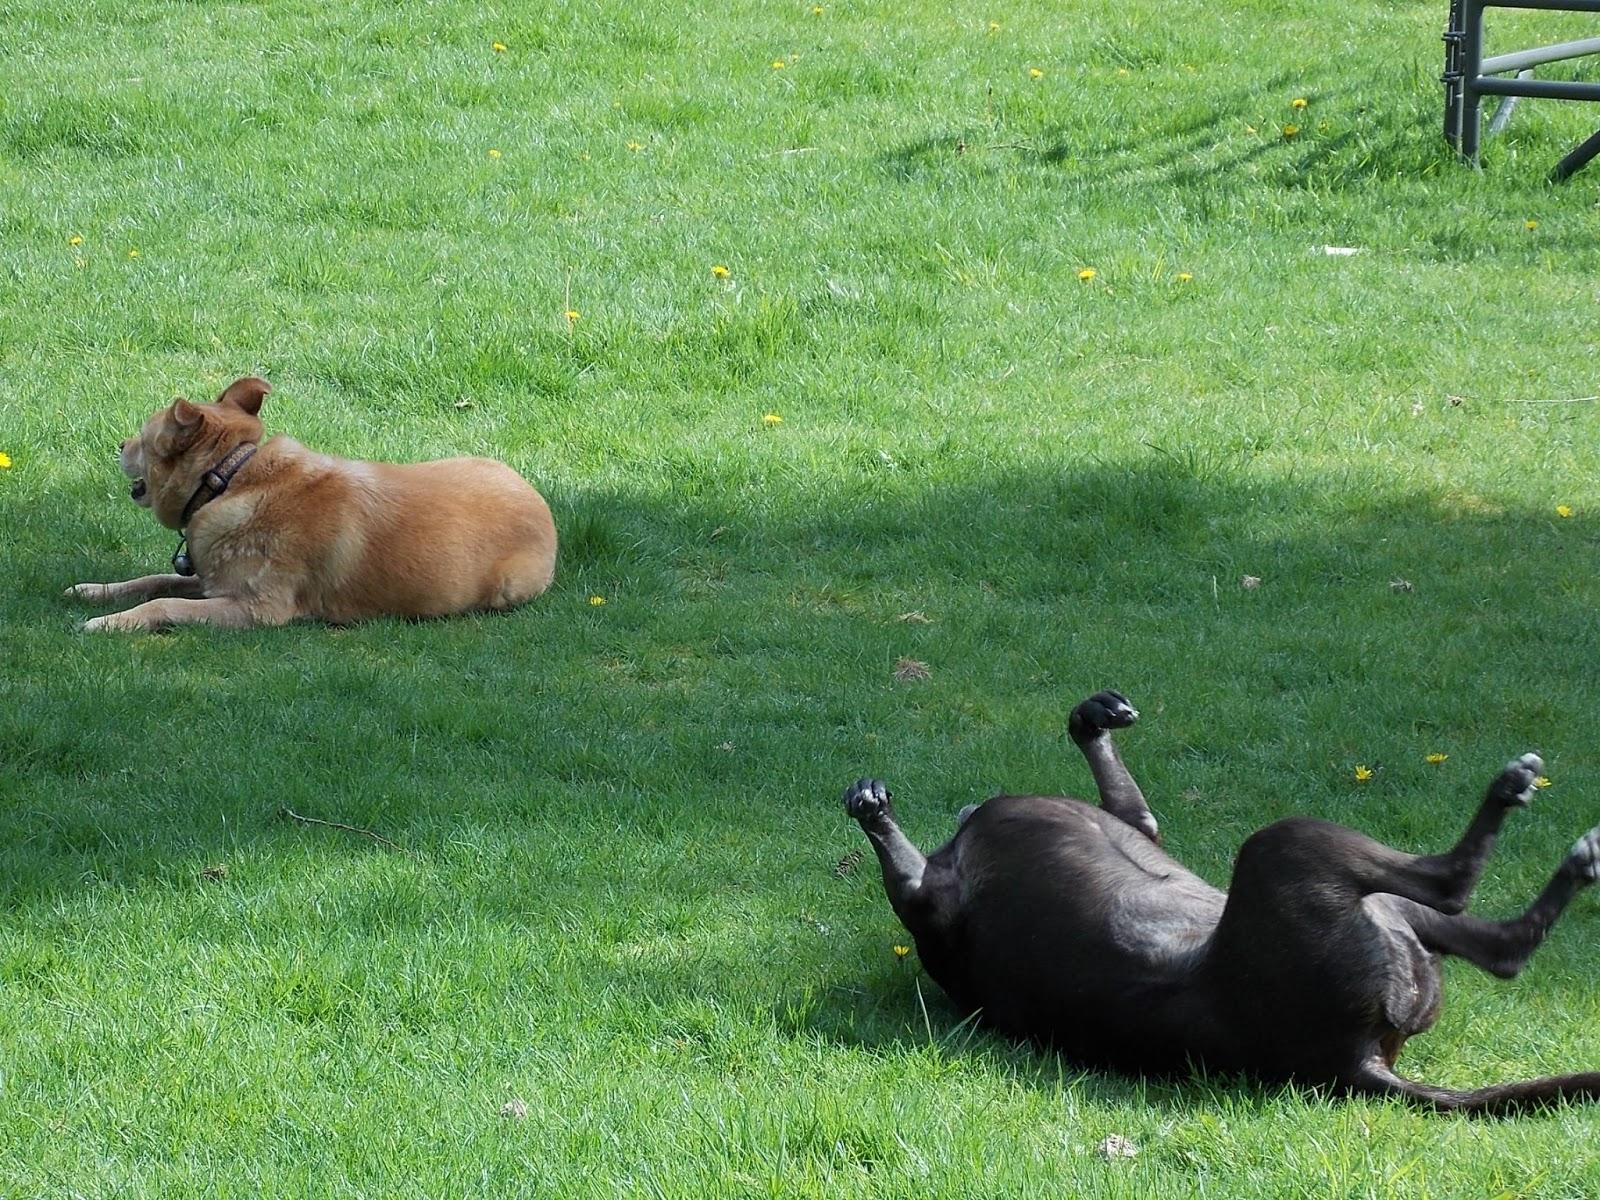 Emerald Aisle Farm: Very happy dogs